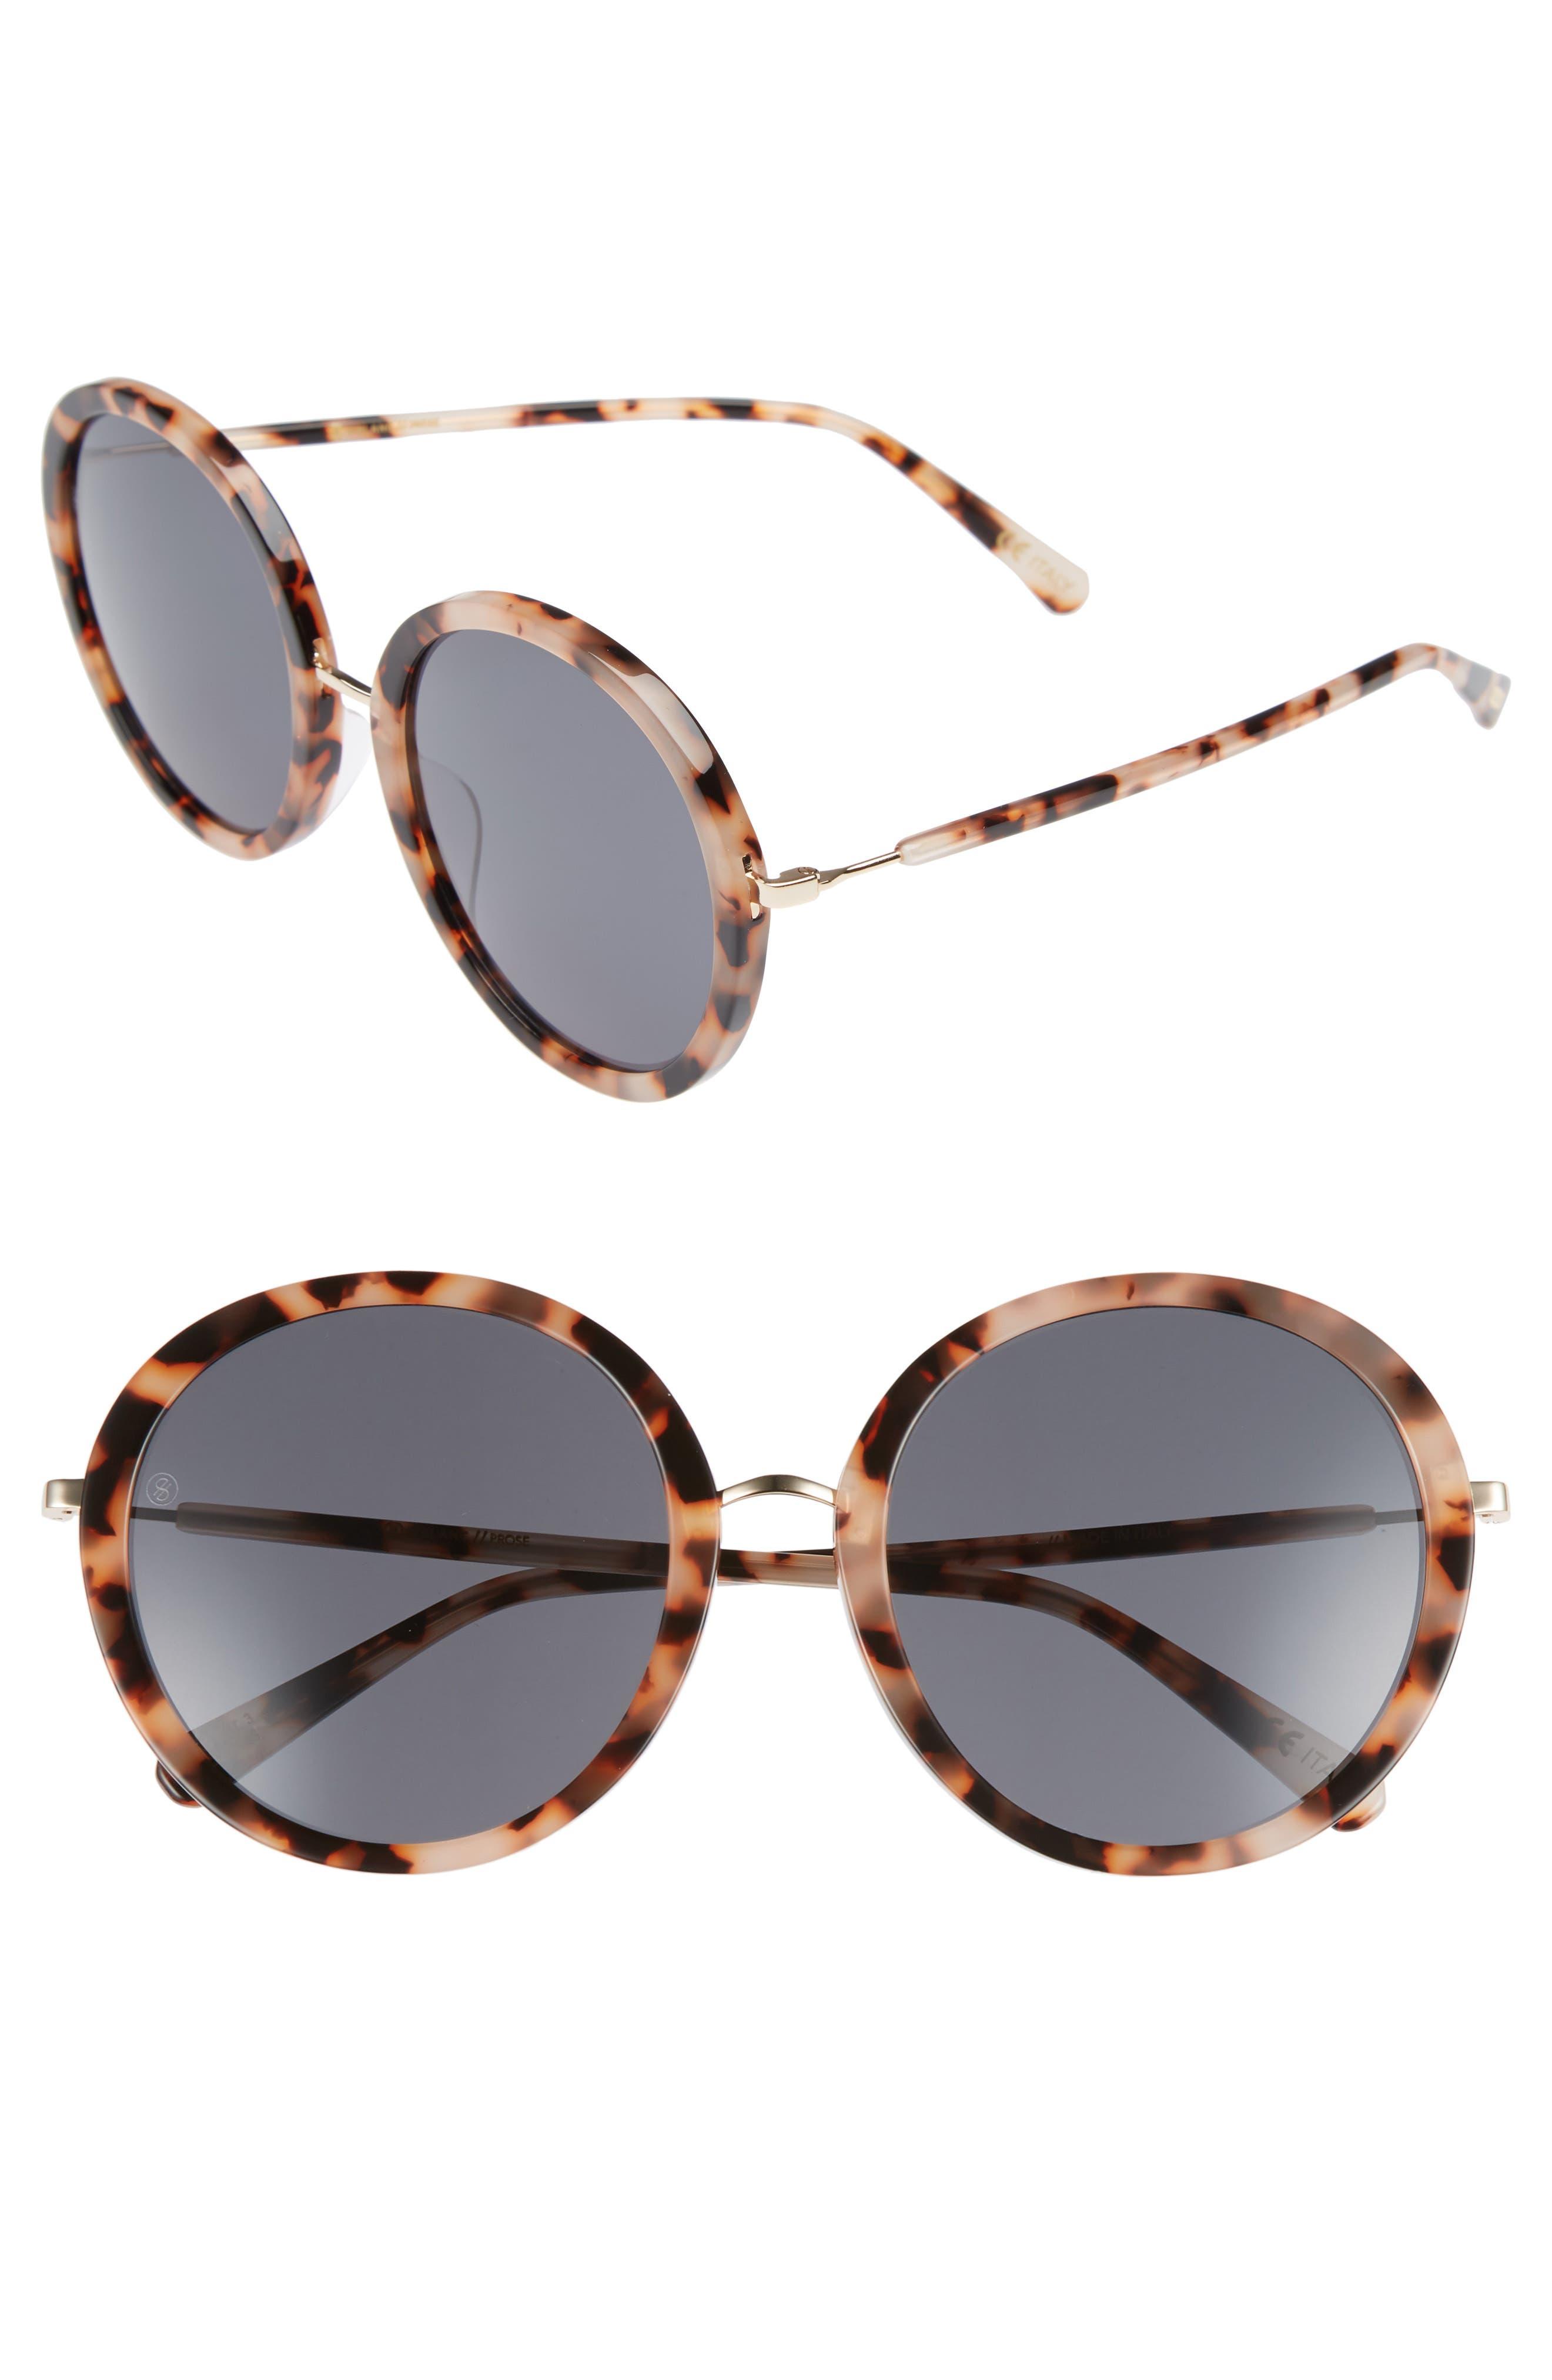 D'BLANC Prose 56mm Round Sunglasses,                         Main,                         color, 200